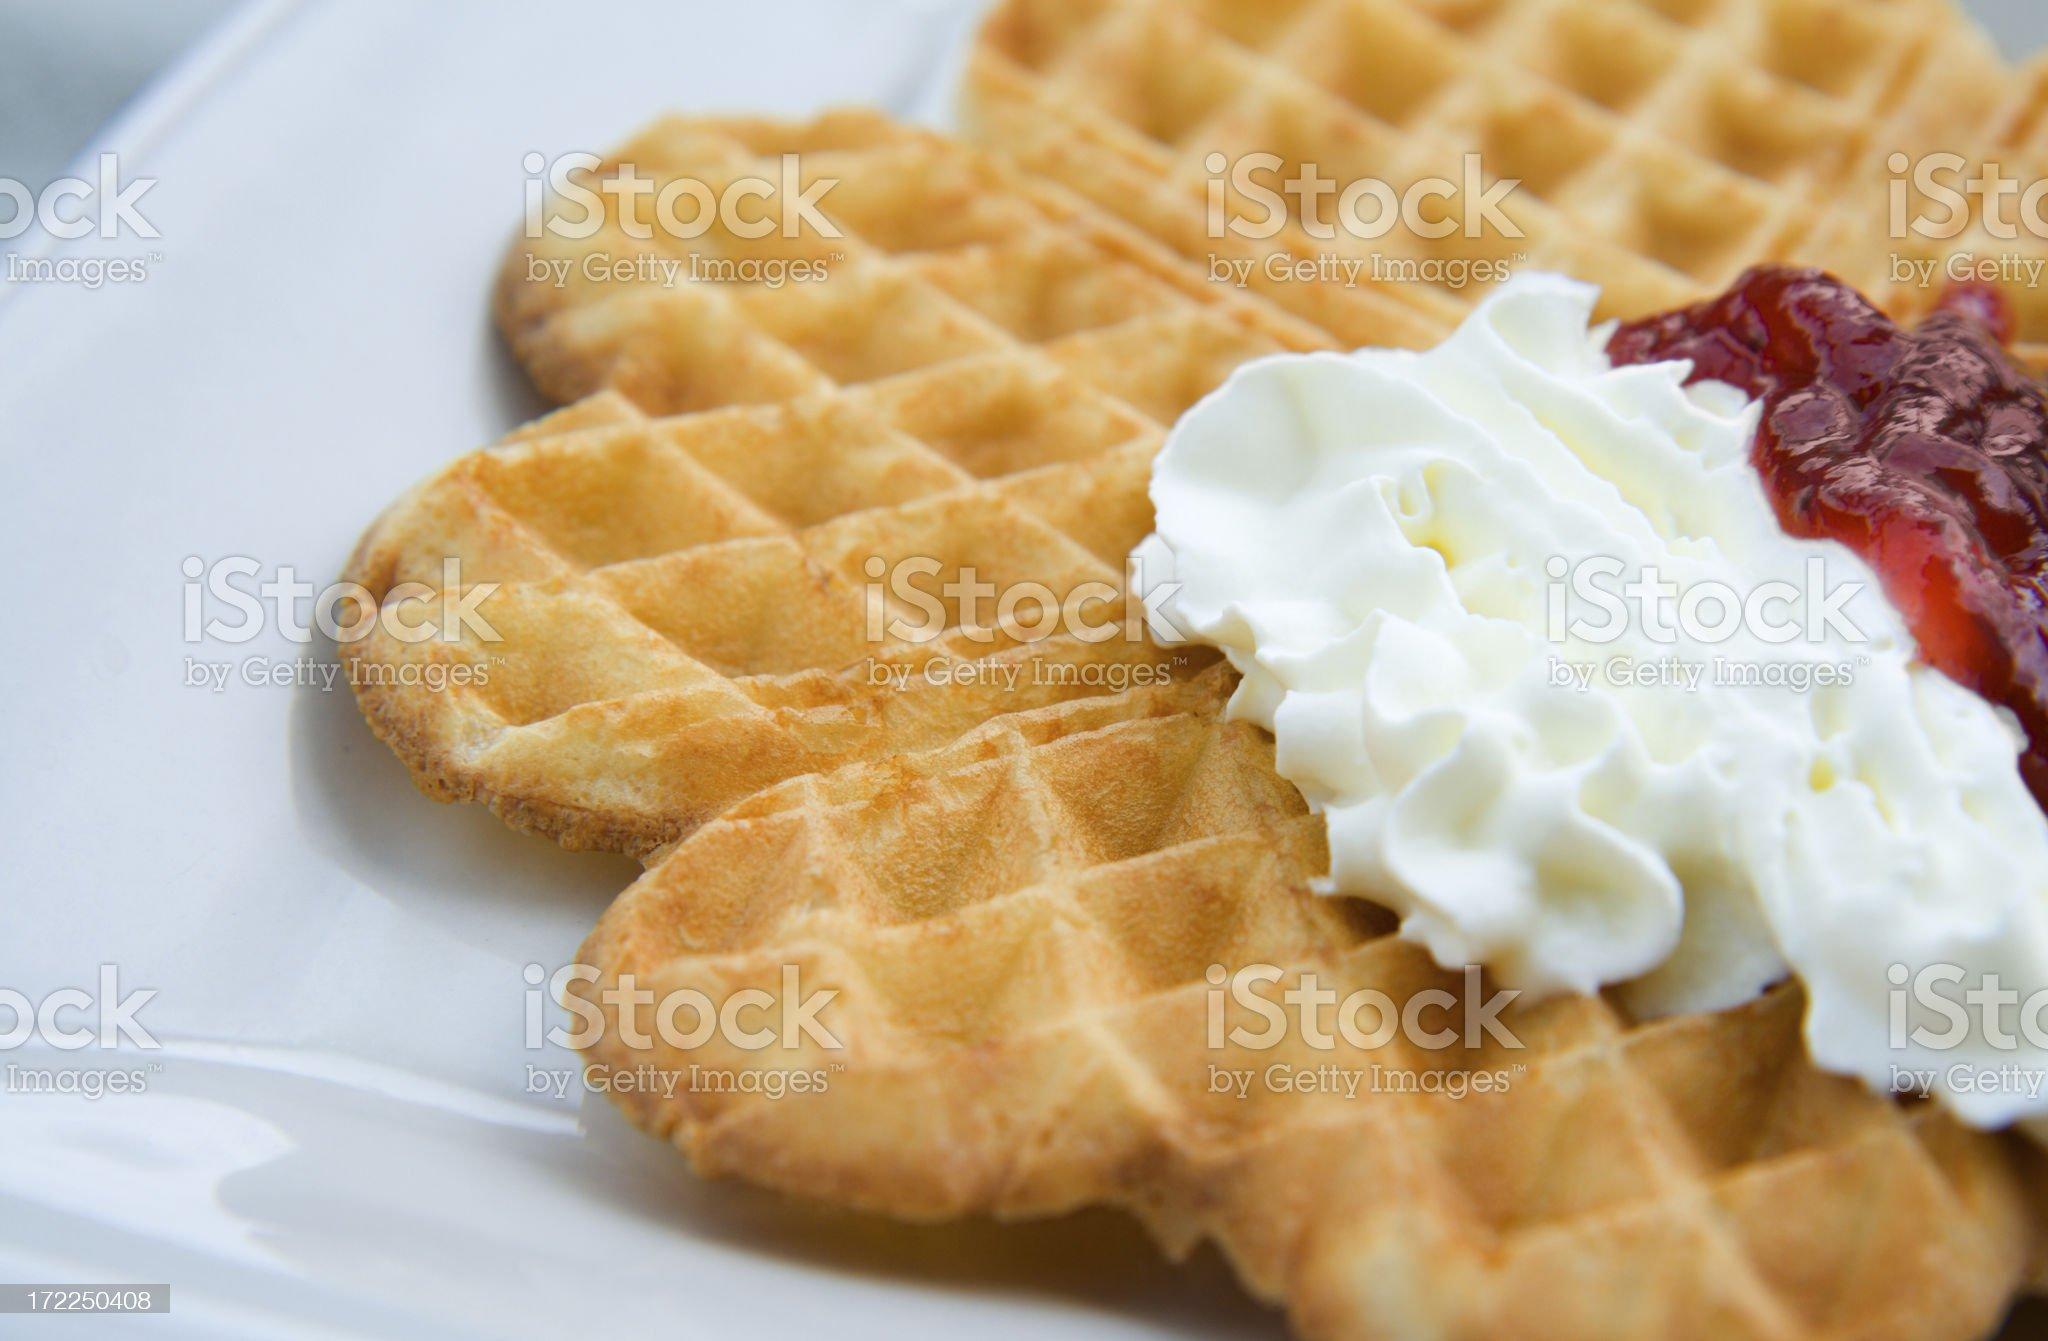 Swedish waffle with strawberry jam and whipped cream royalty-free stock photo